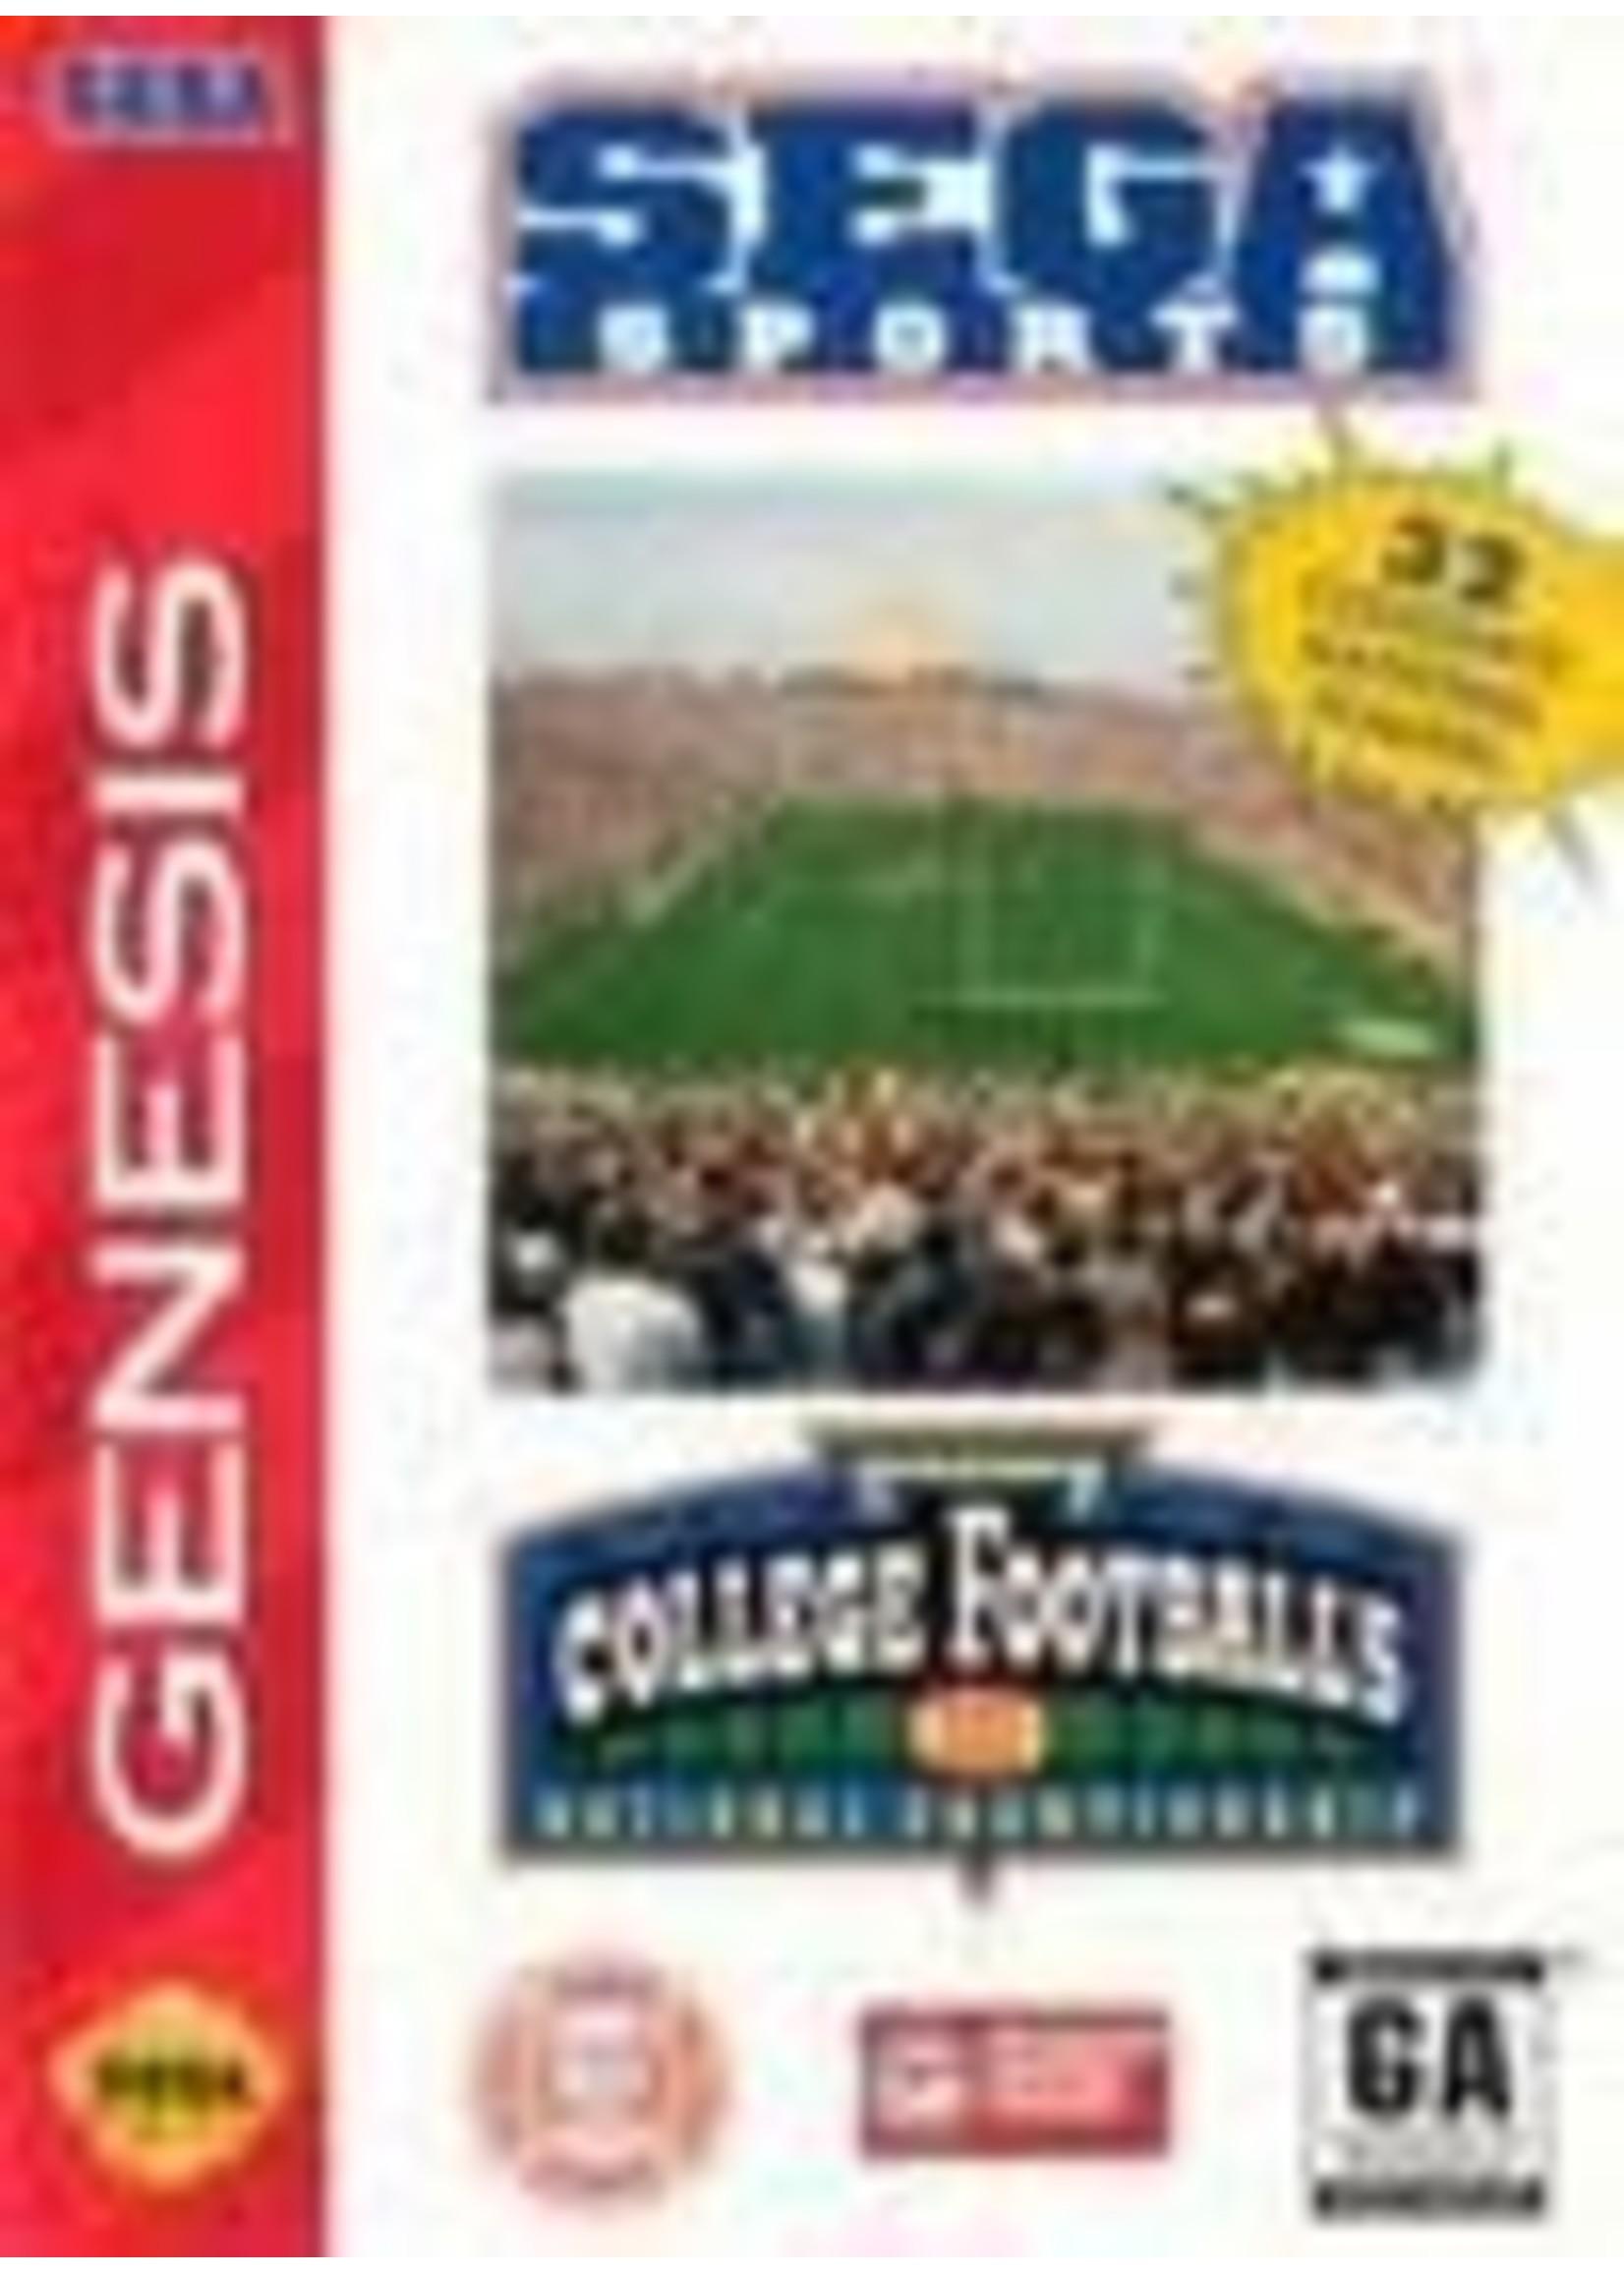 College Football's National Championship Sega Genesis